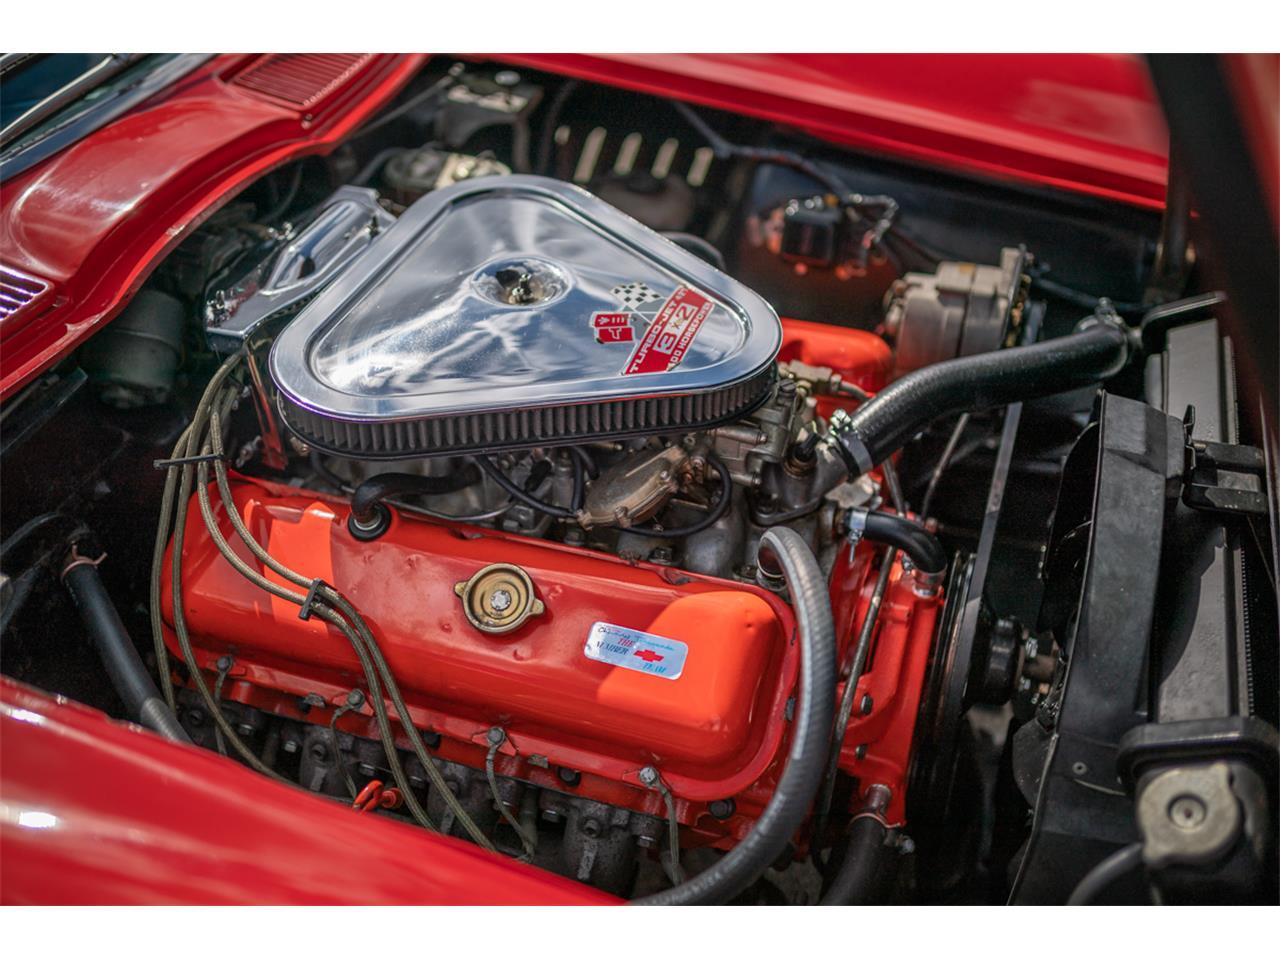 1967 Chevrolet Corvette Stingray (CC-1335257) for sale in Monterey, California